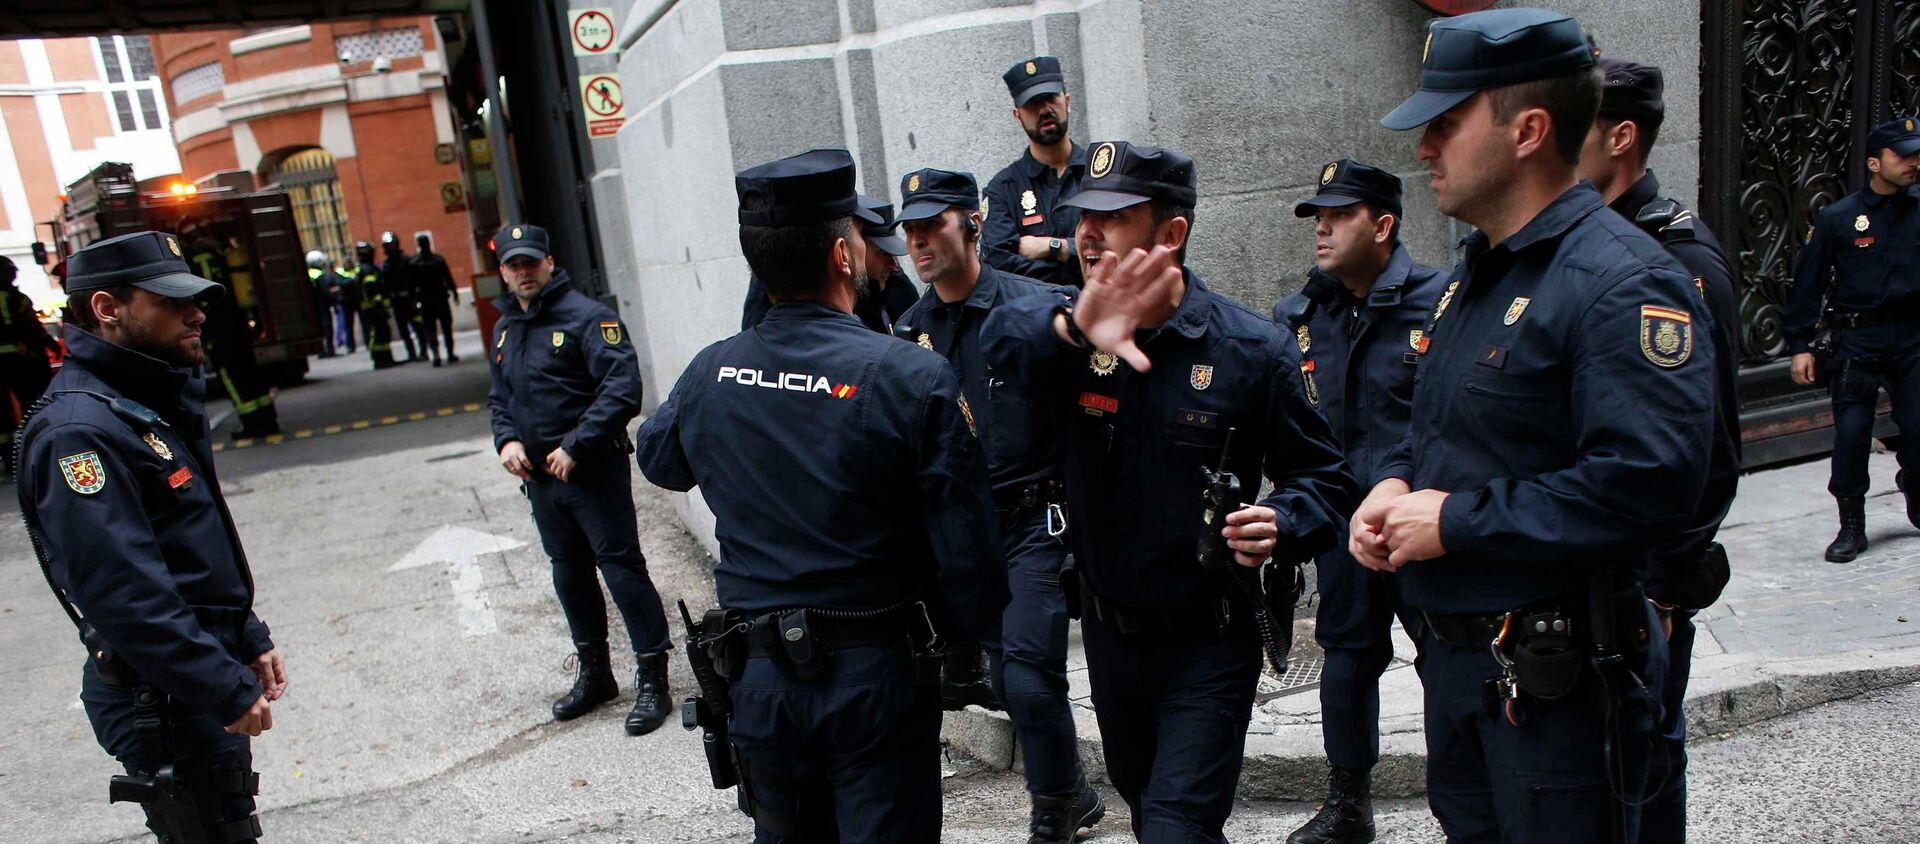 Police espagnole - Sputnik France, 1920, 19.06.2020